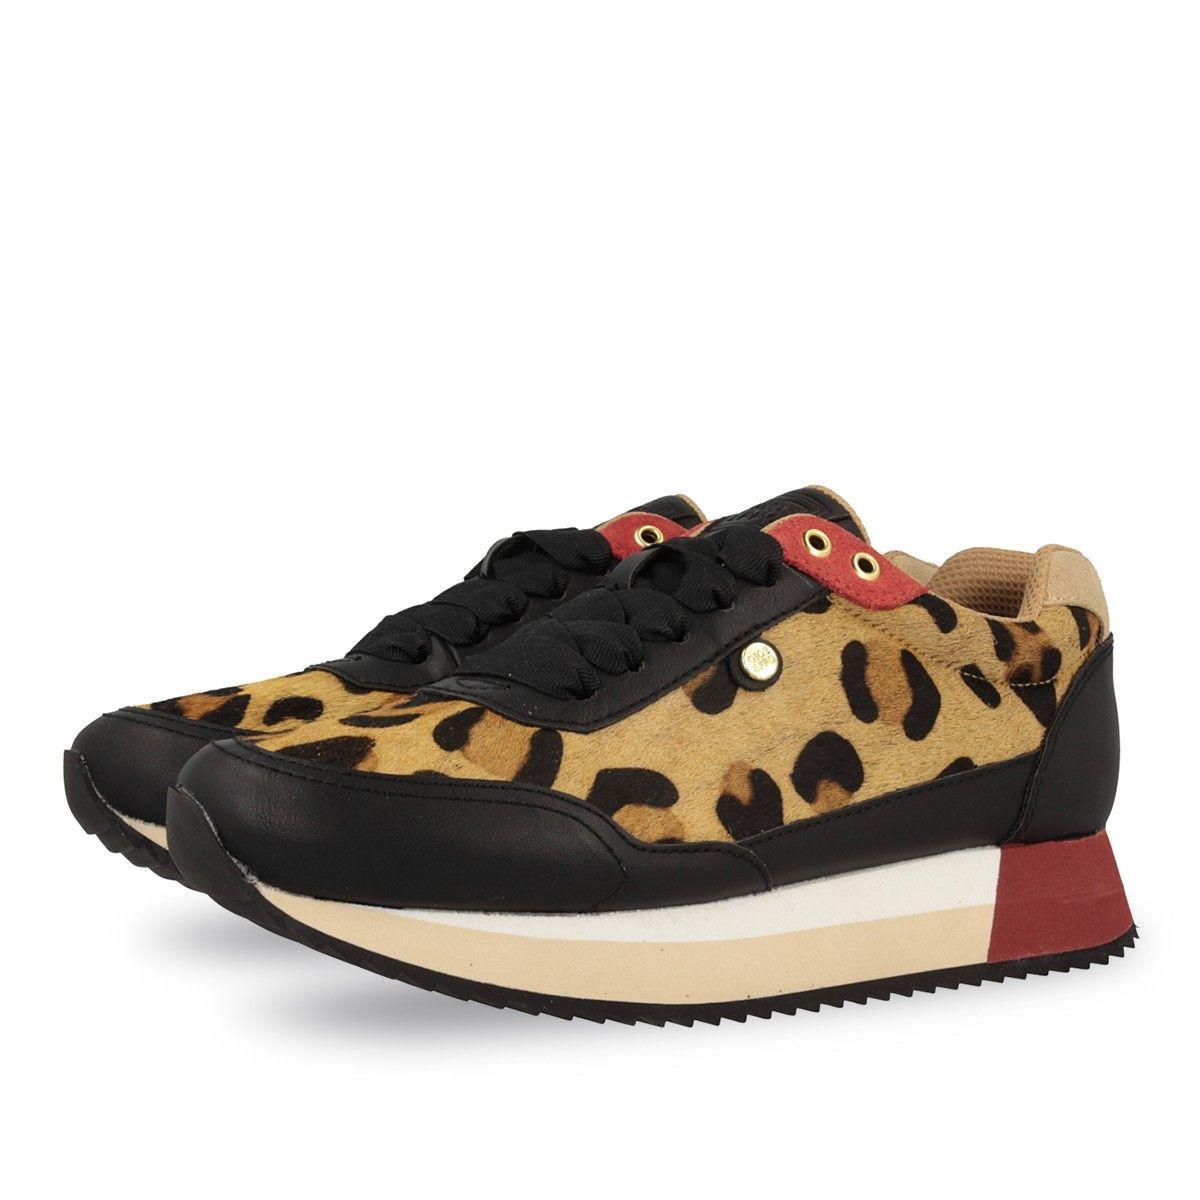 GIOSEPPO Sneakers & Deportivas mujer kXFdbdS5